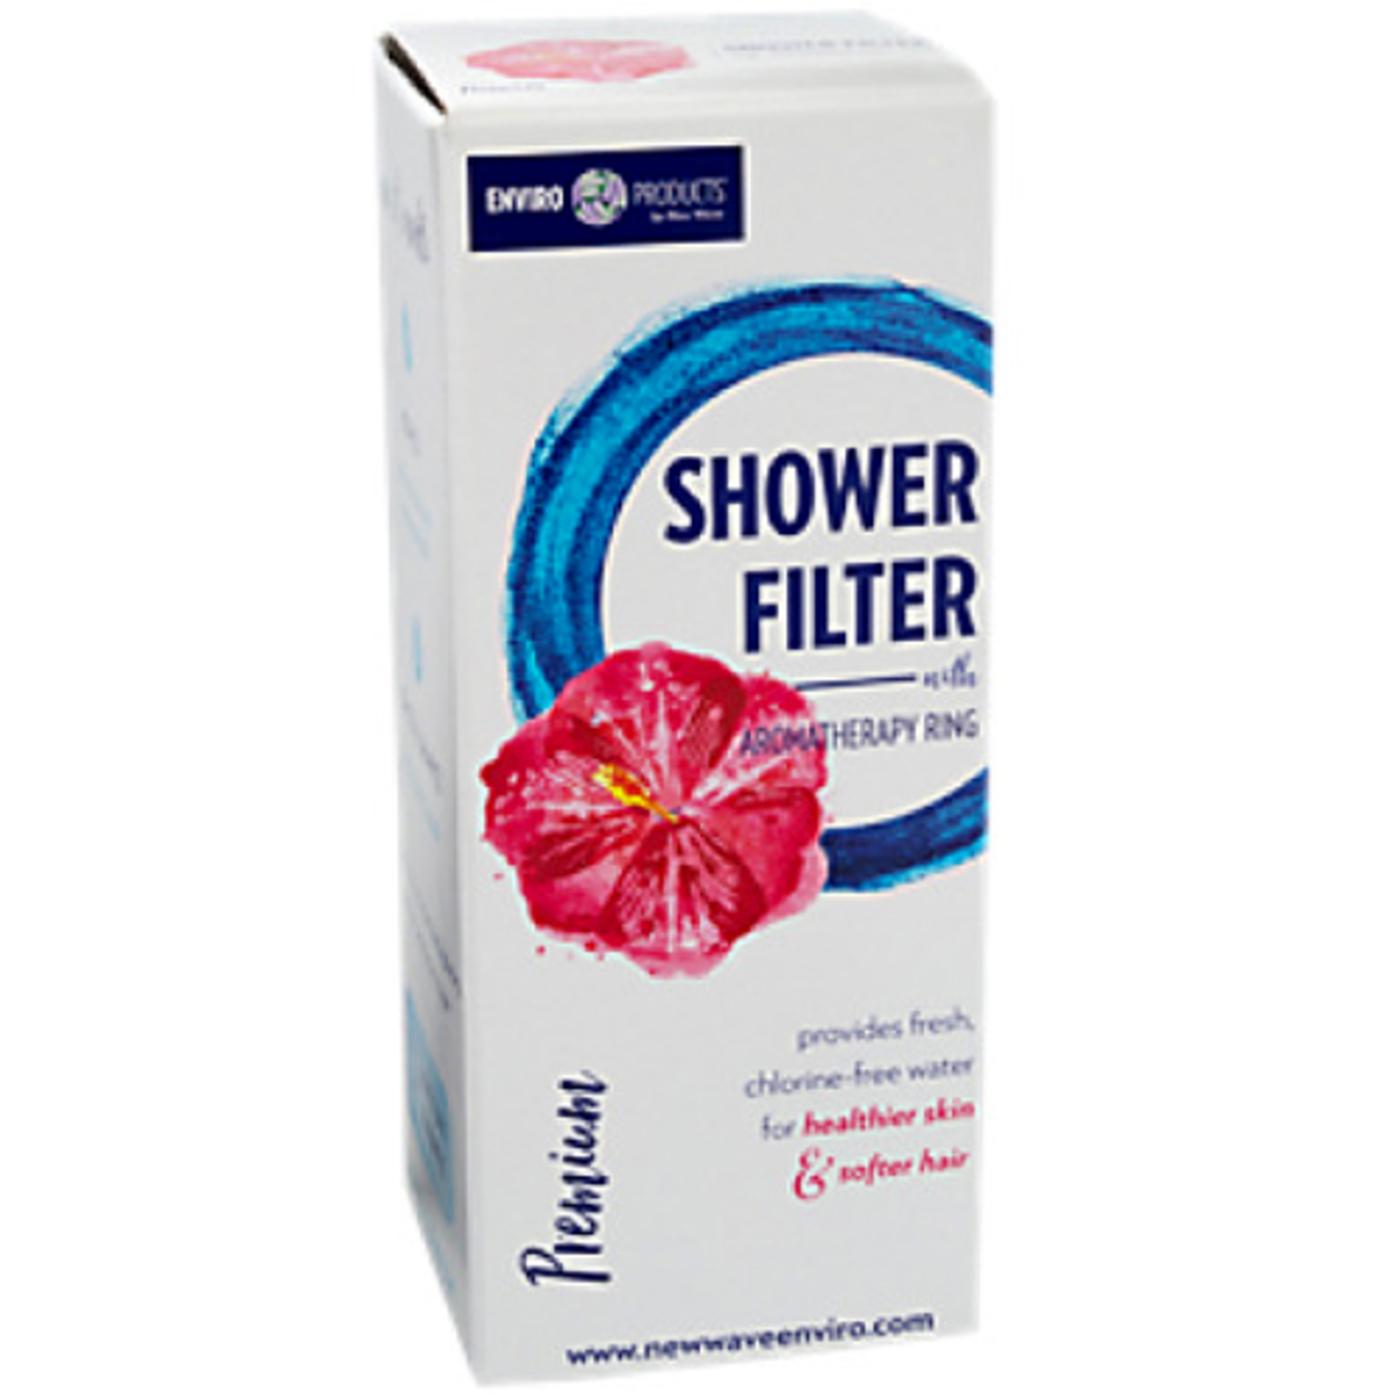 buy new wave enviro premium shower filter 1 filter evitamins australia. Black Bedroom Furniture Sets. Home Design Ideas